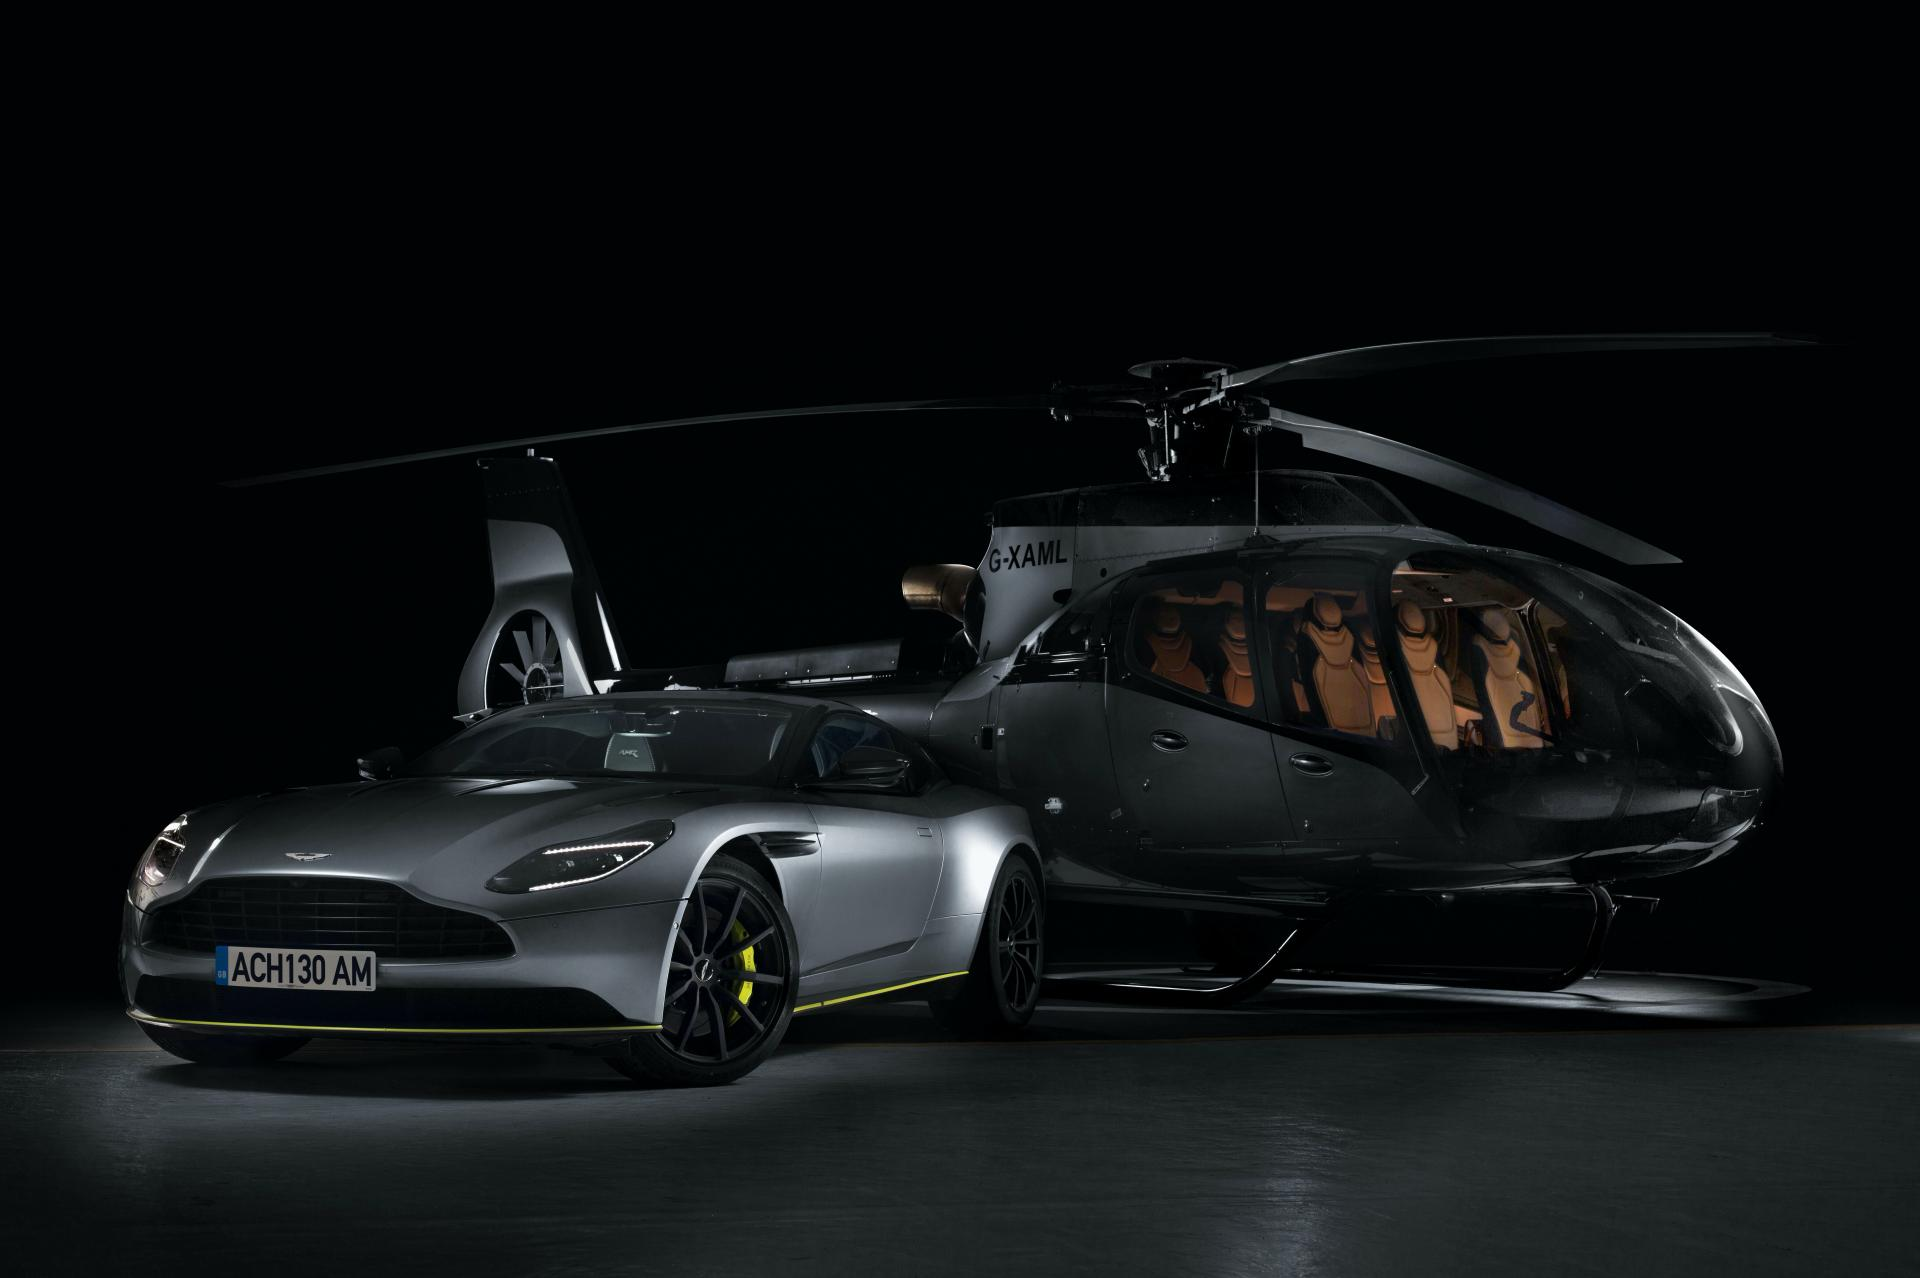 ACH130-Aston-Martin (1)